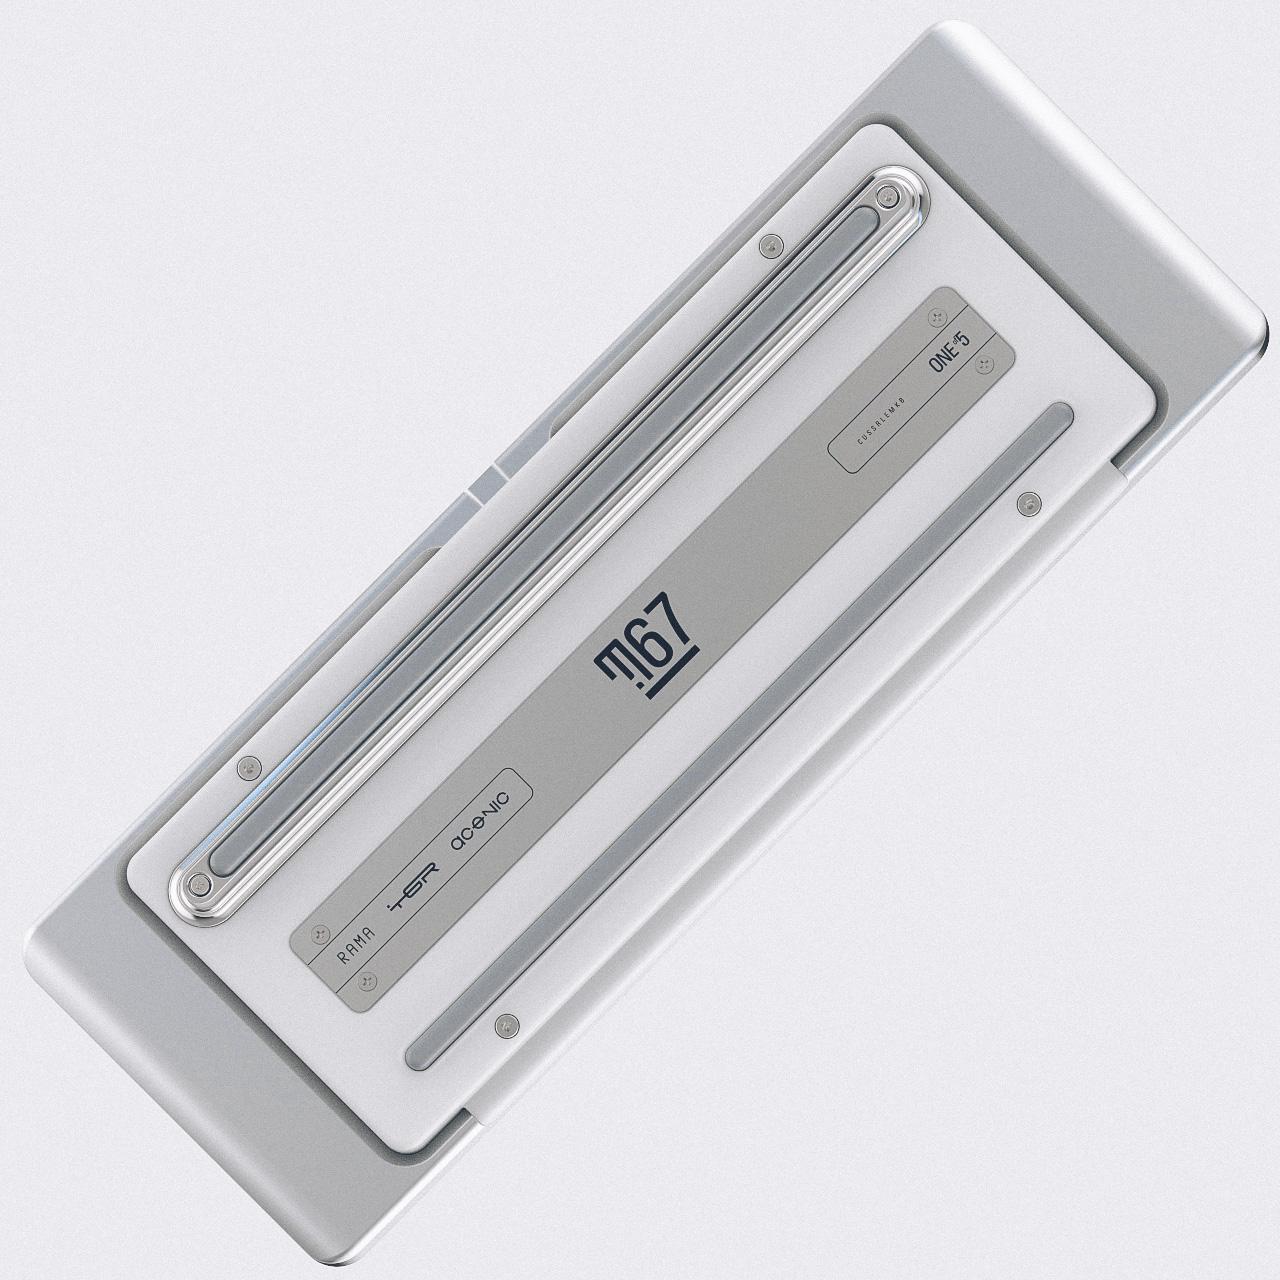 RAMA-161024-COMPRESSED-RAMA-AMOS-67-R02.509.jpg